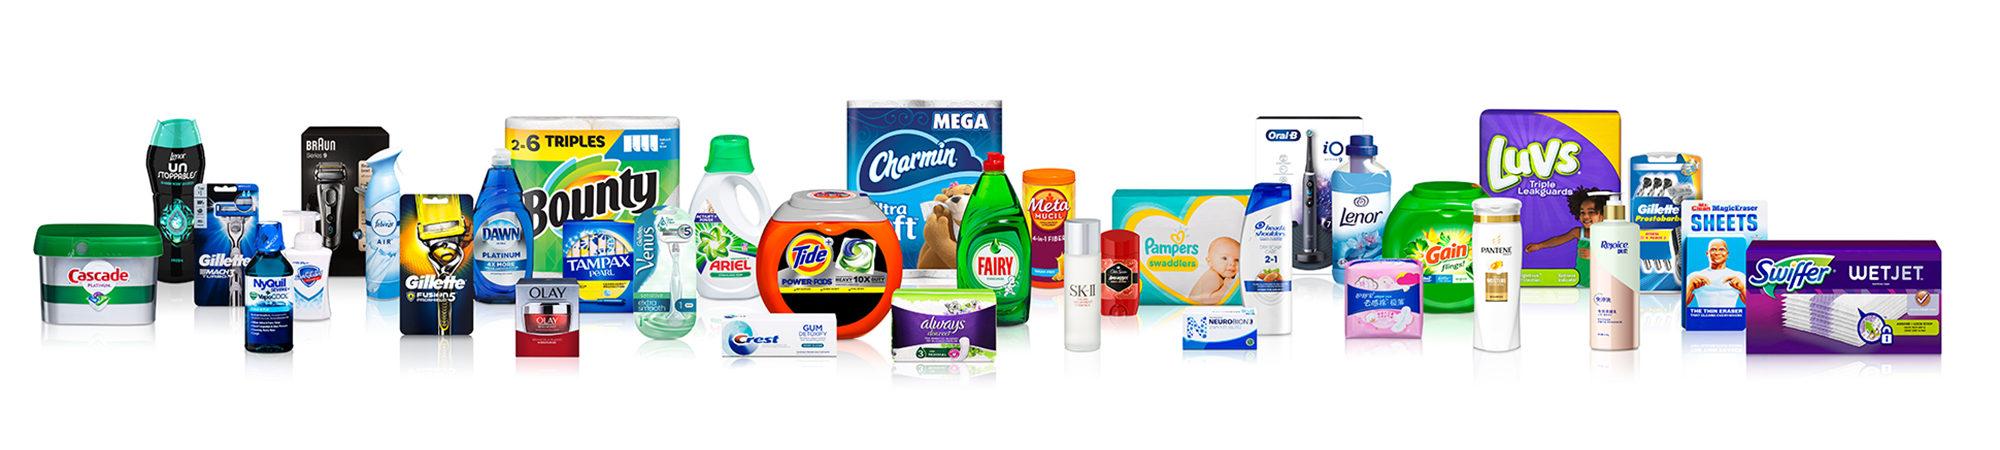 Procter & Gamble Markenportfolio